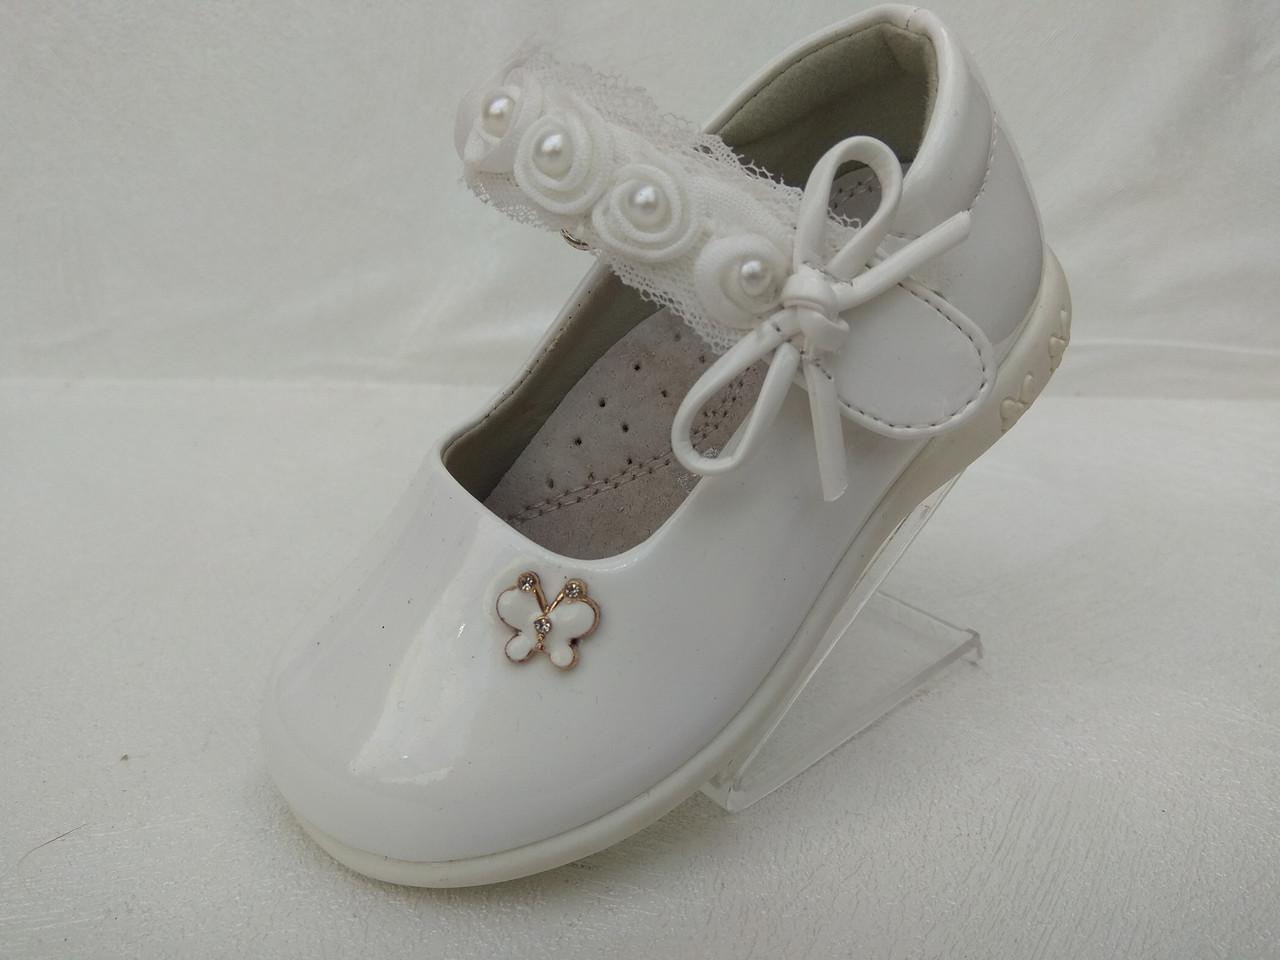 Туфли для девочки оптом Apawwa D37 white (р.21-26) - Оптовый 56a55773fc821